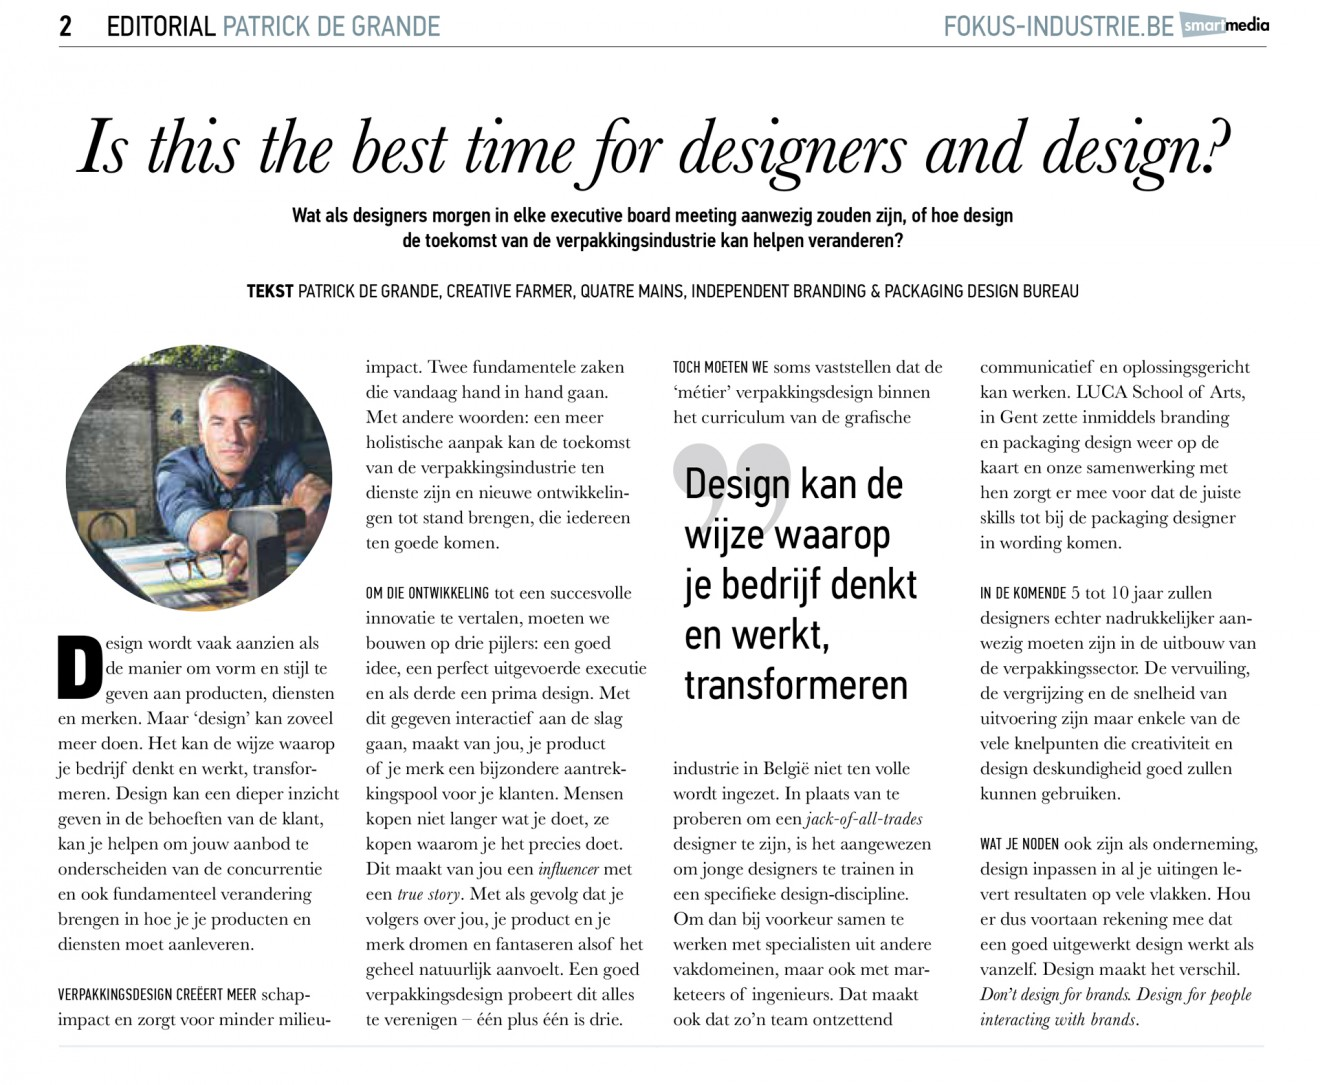 Quatre Mains package design - article, september